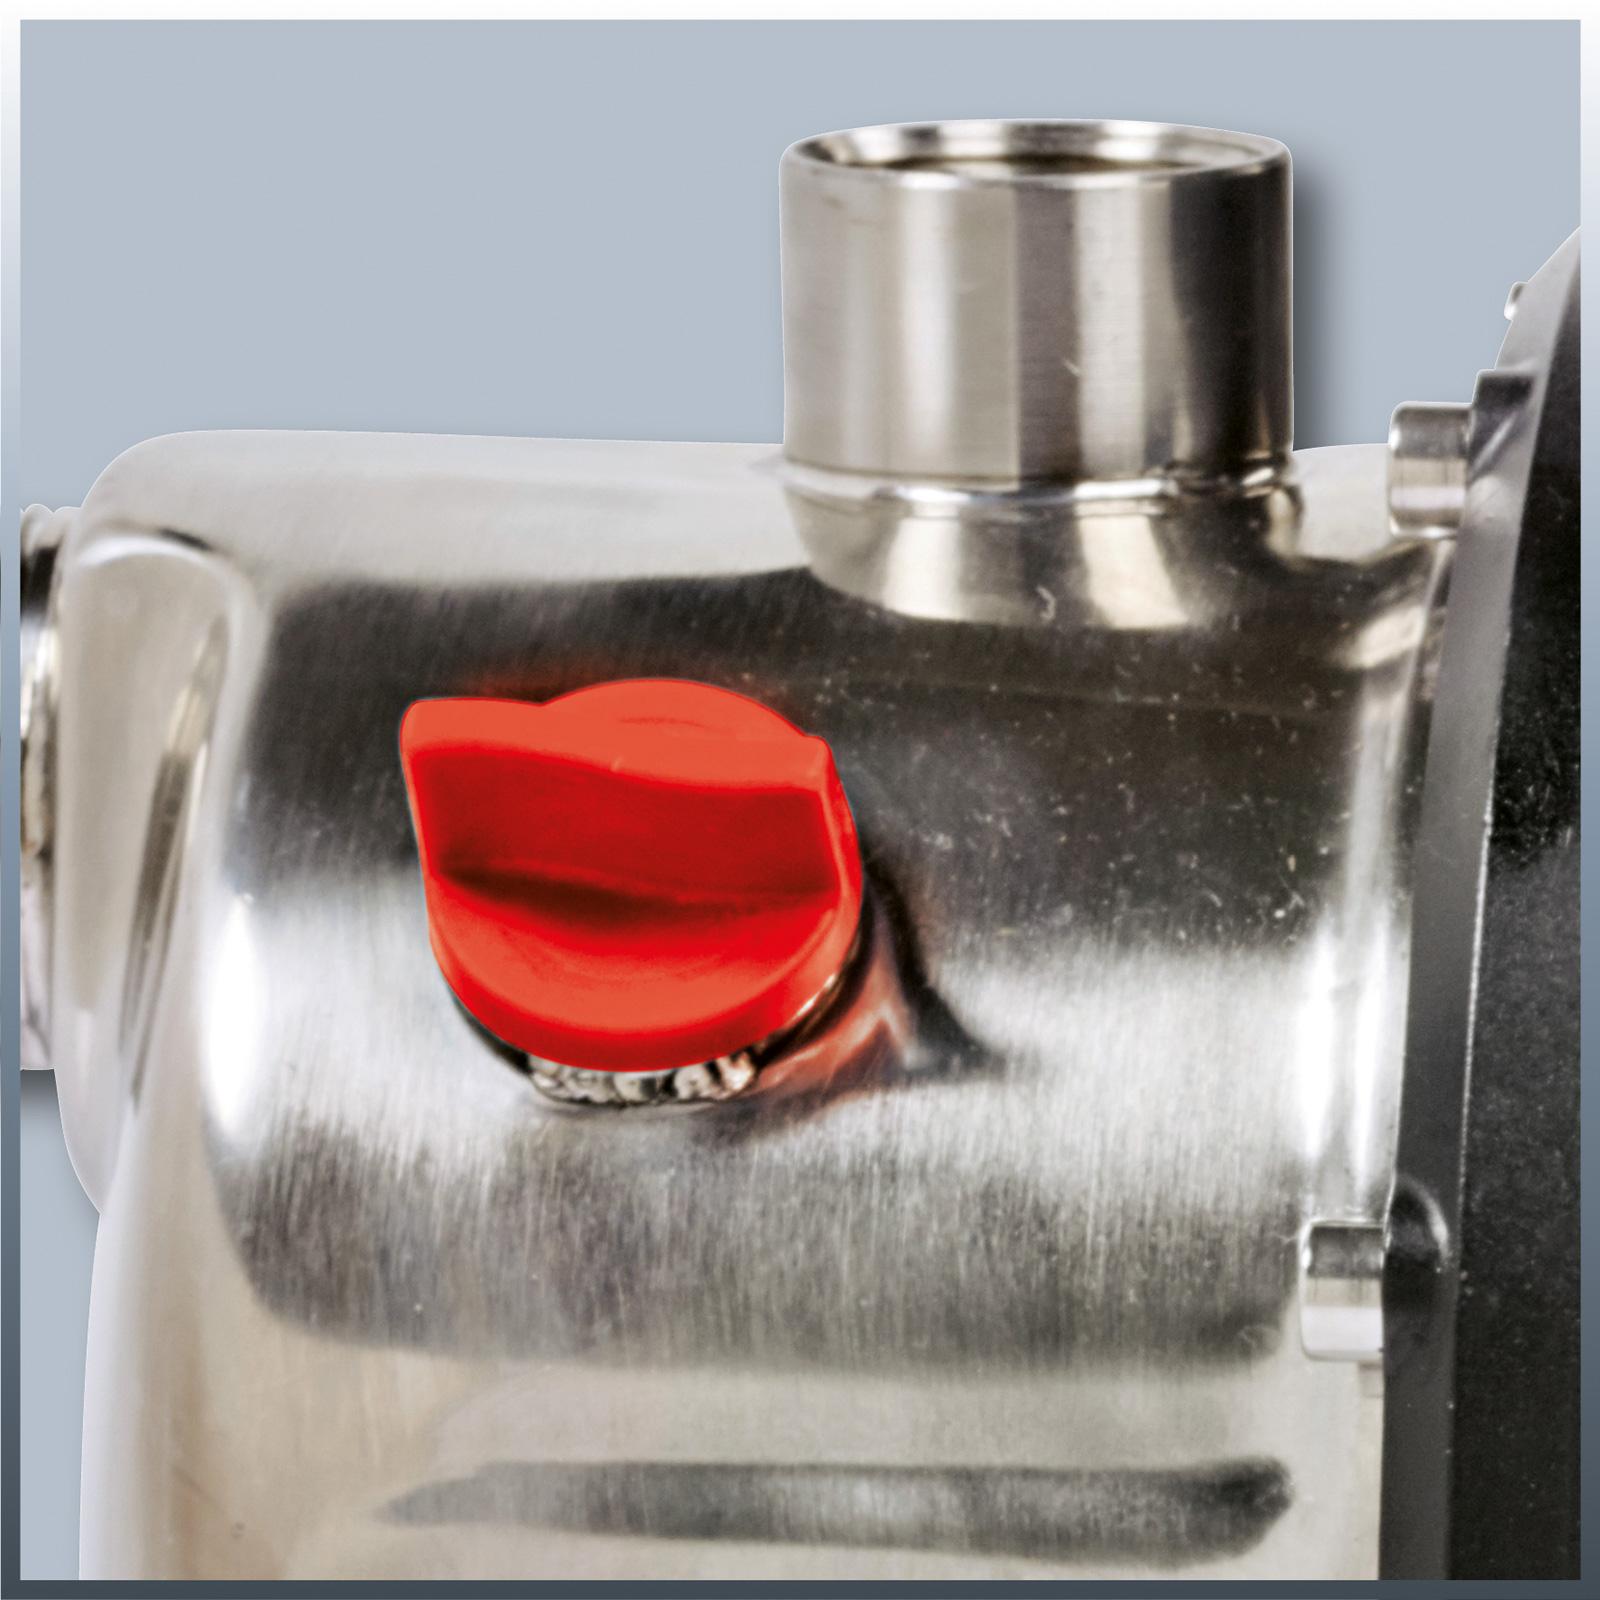 Einhell gc gp 1046 n gartenpumpe wasserpumpe jetpumpe bew sserungspumpe neu 4006825616279 ebay - Einhell gartenpumpe anleitung ...